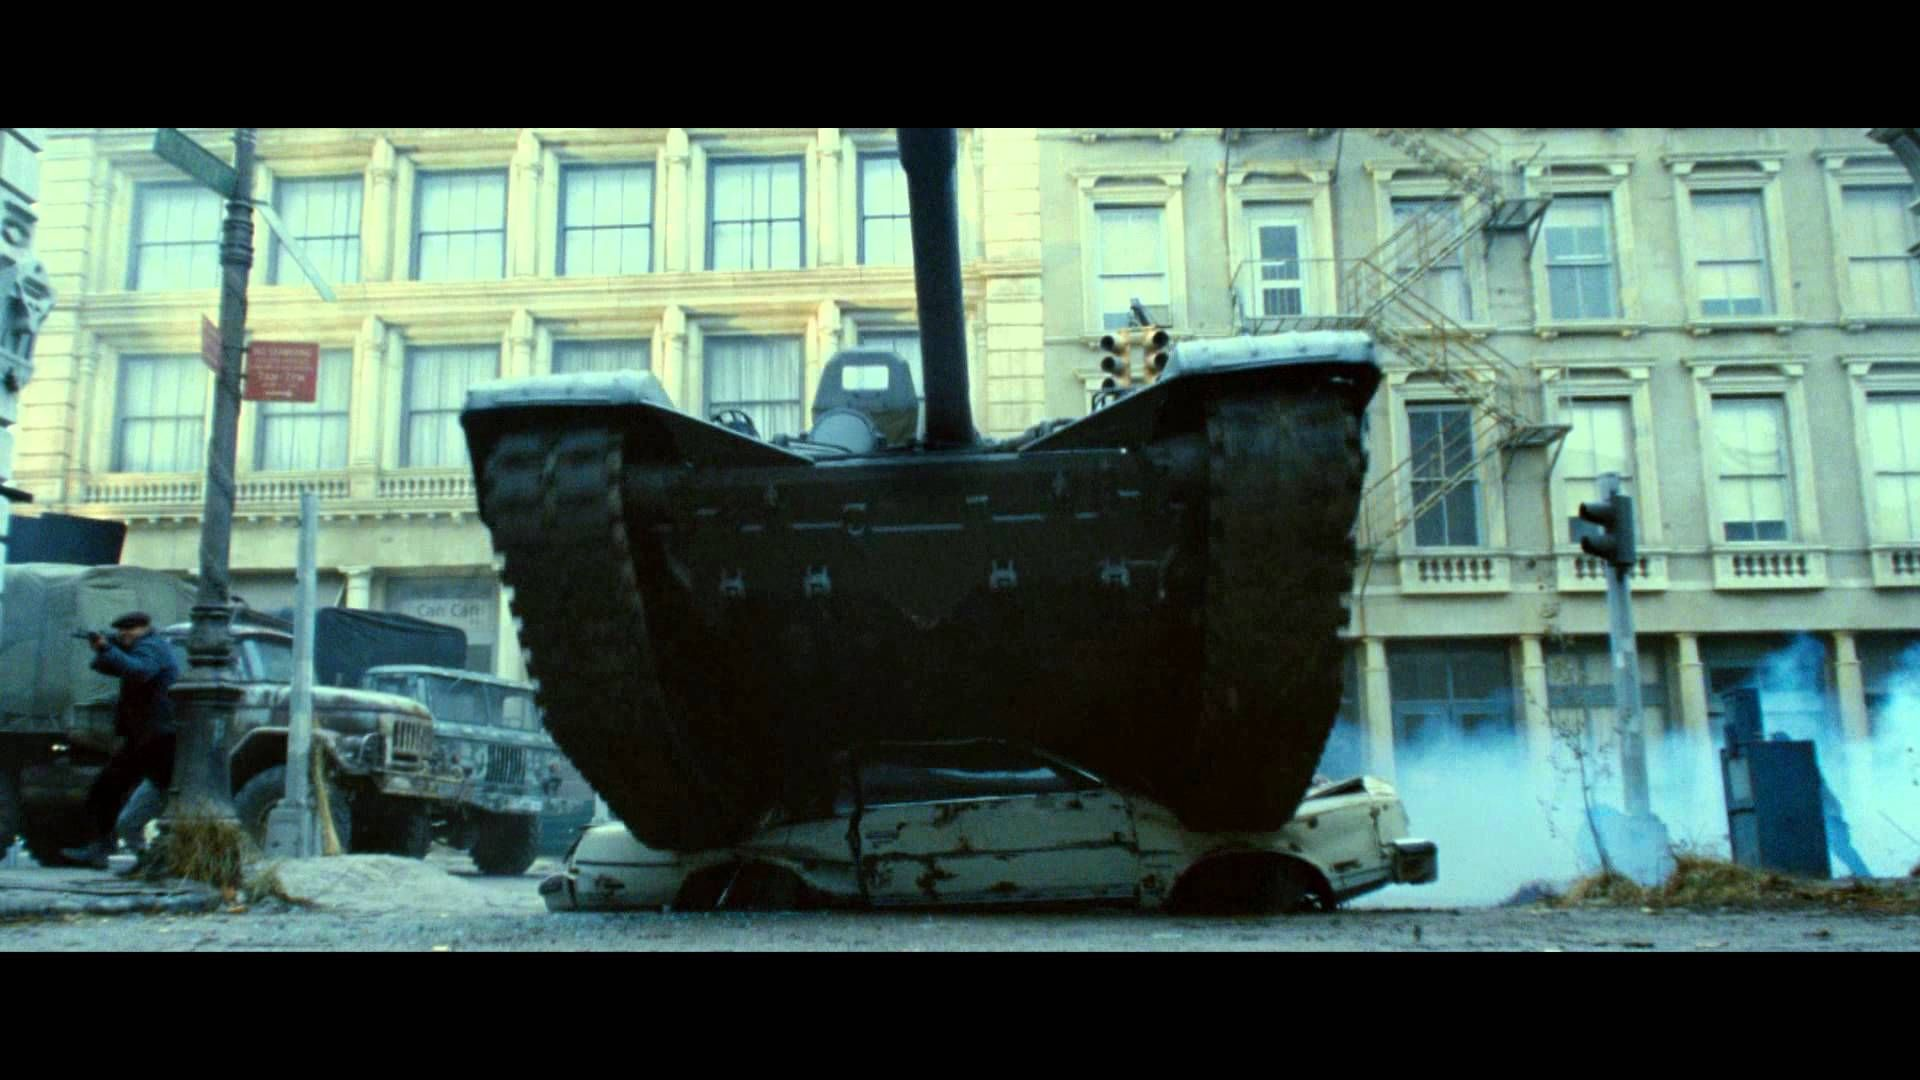 A Felaldozhatok 3 2017 Teljes Film Magyarul 2017 Youtube The Expendables Expendables 3 Sylvester Stallone